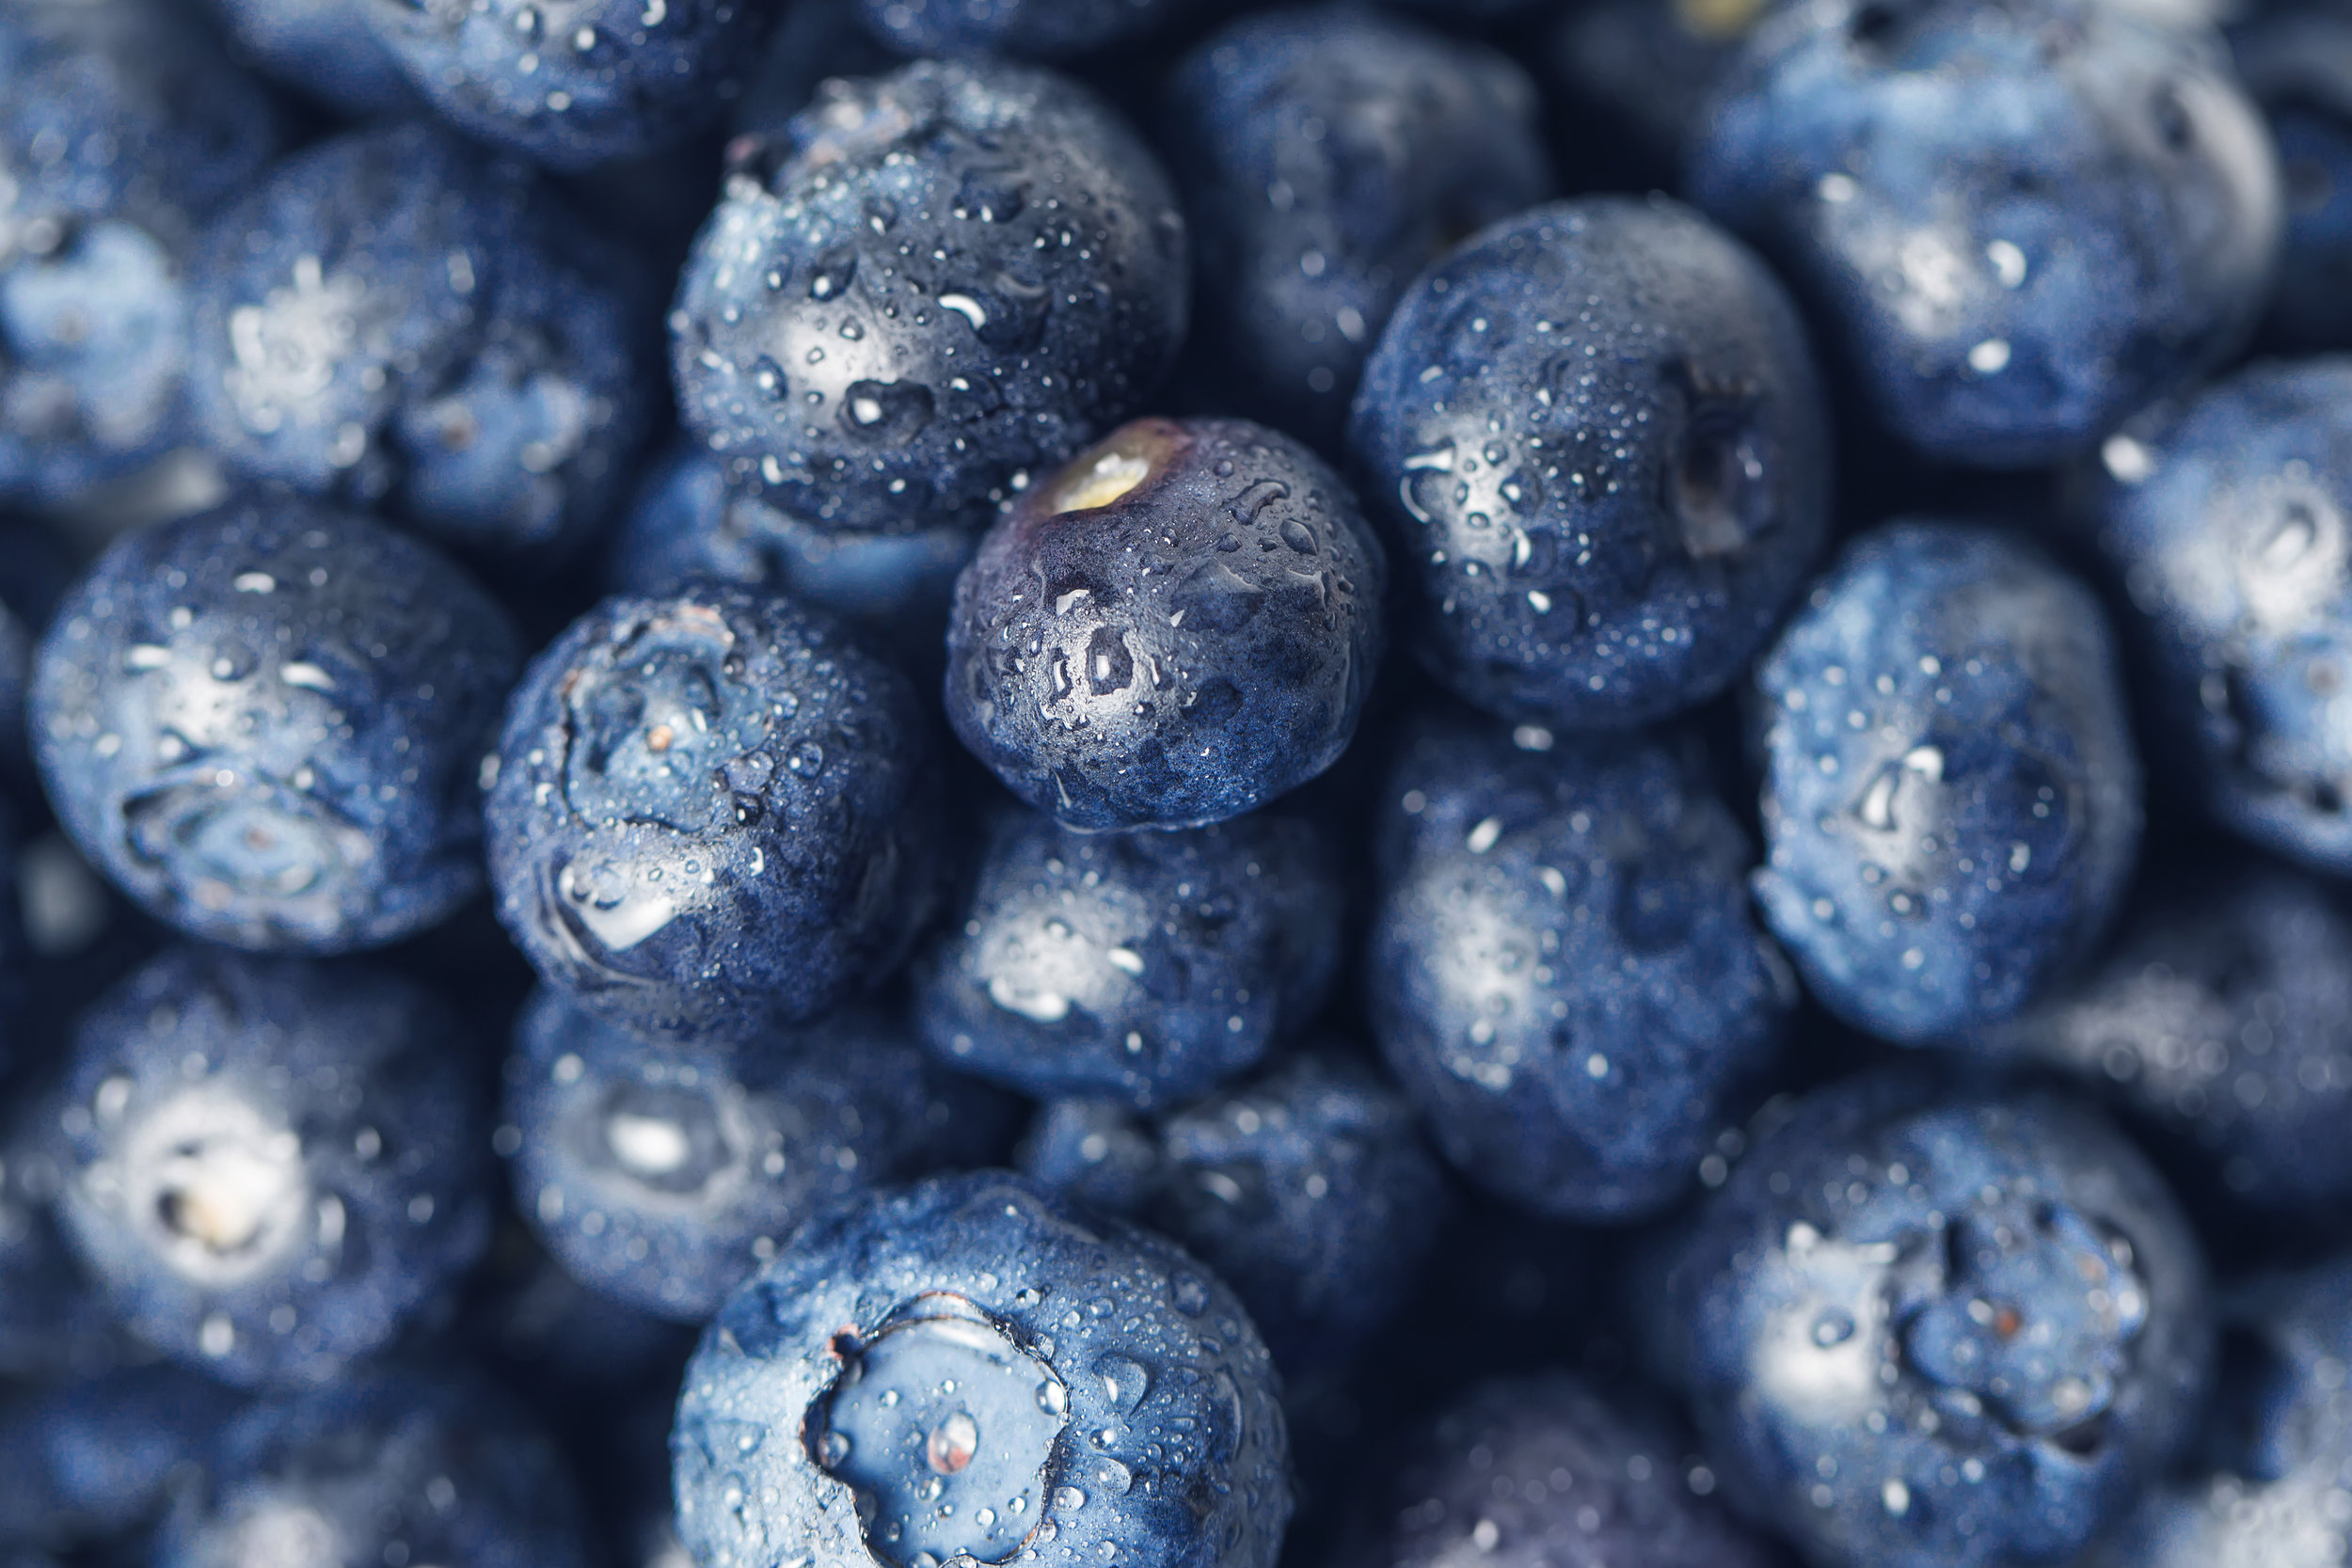 blueberry closeup.jpg